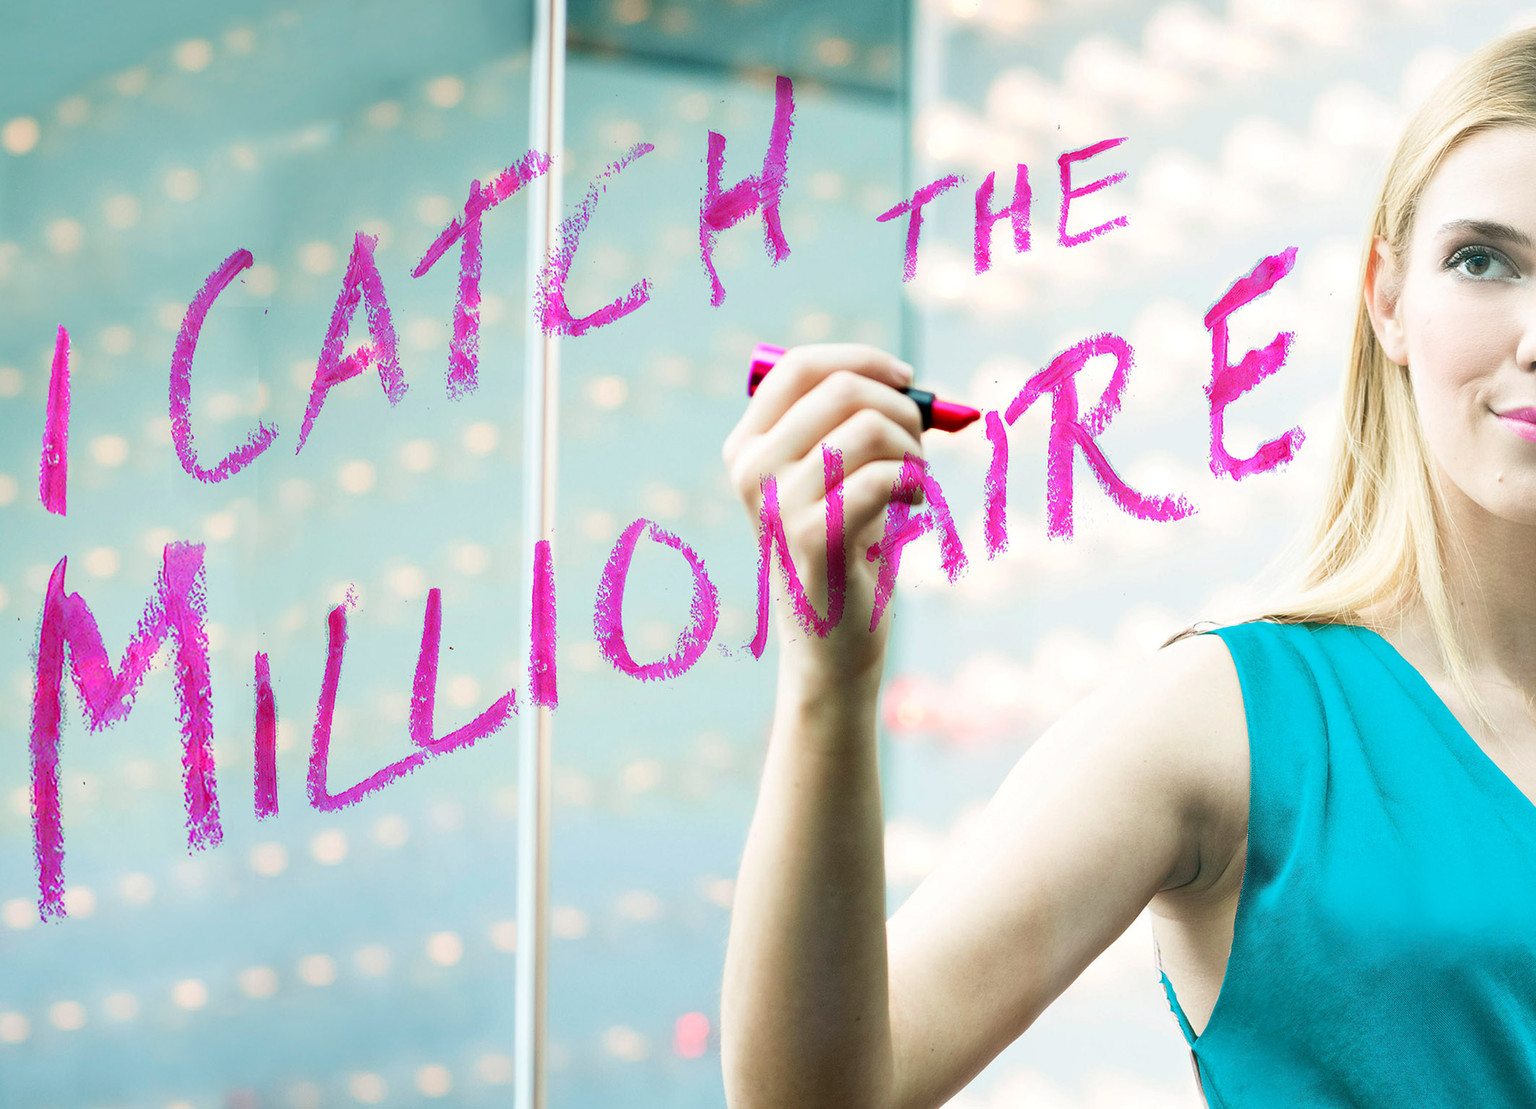 millionaire dating etiquette reality show